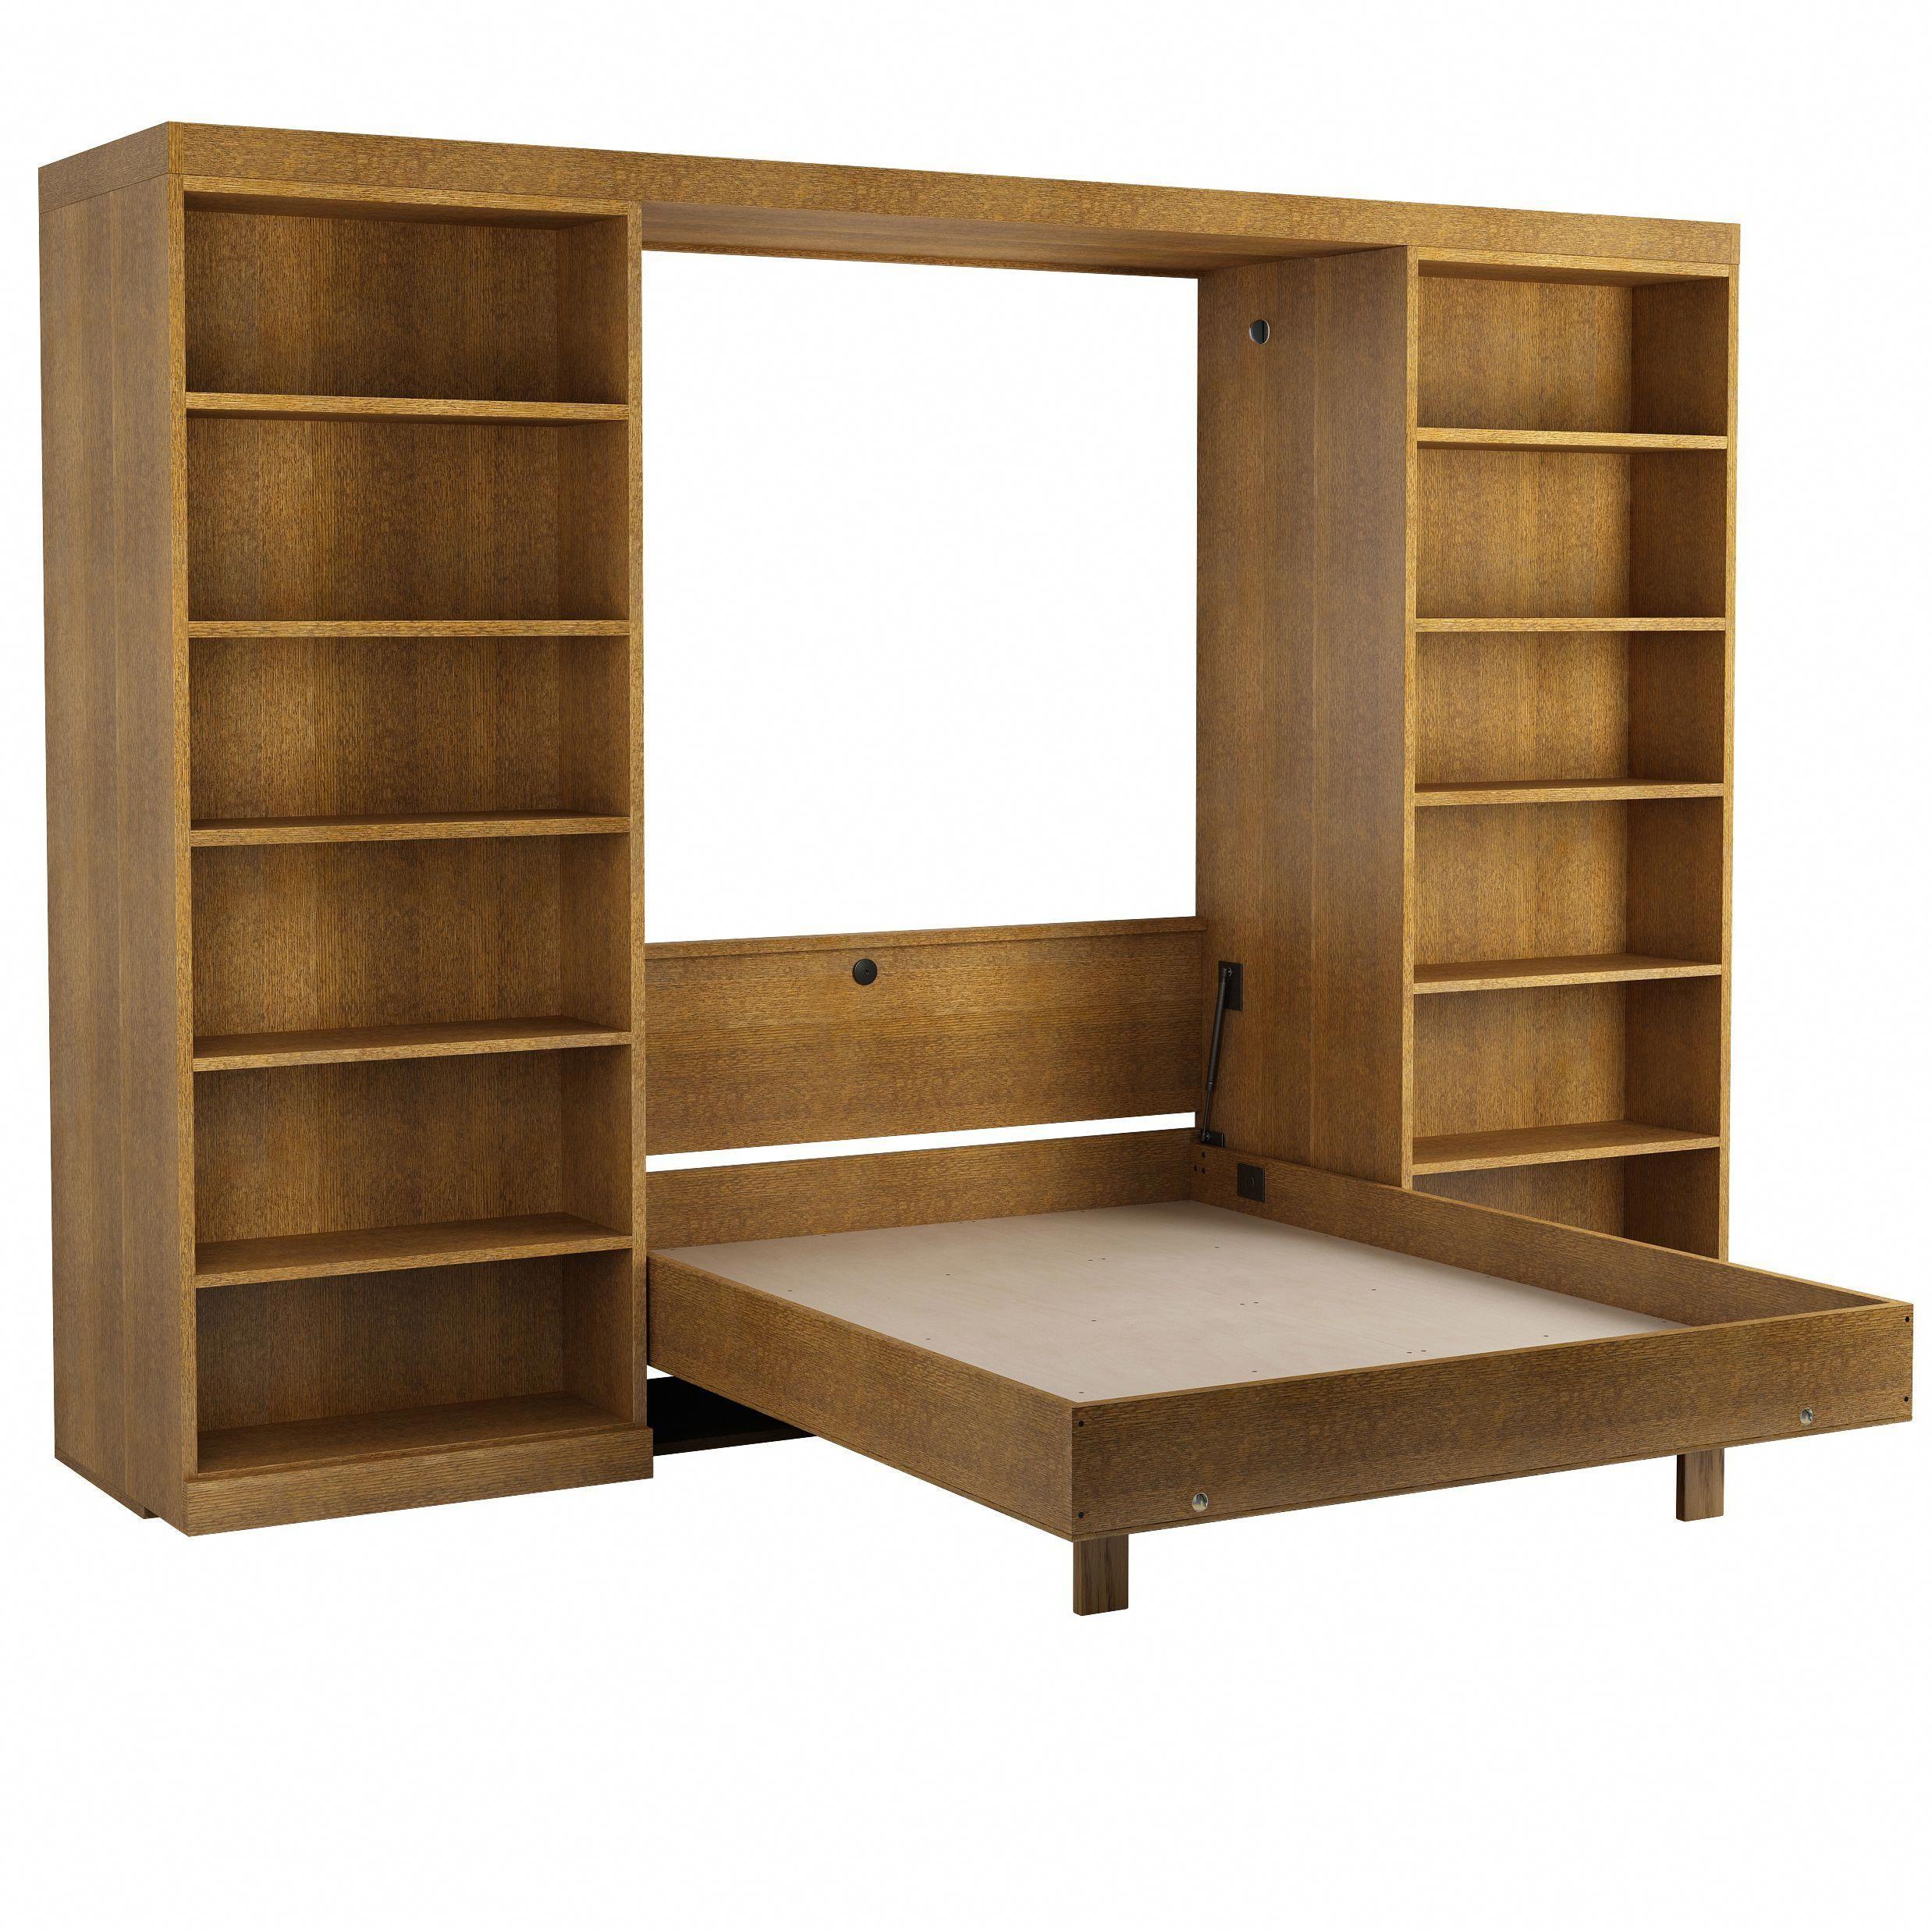 Abbott library bed in oak walnut finish shown with bed open